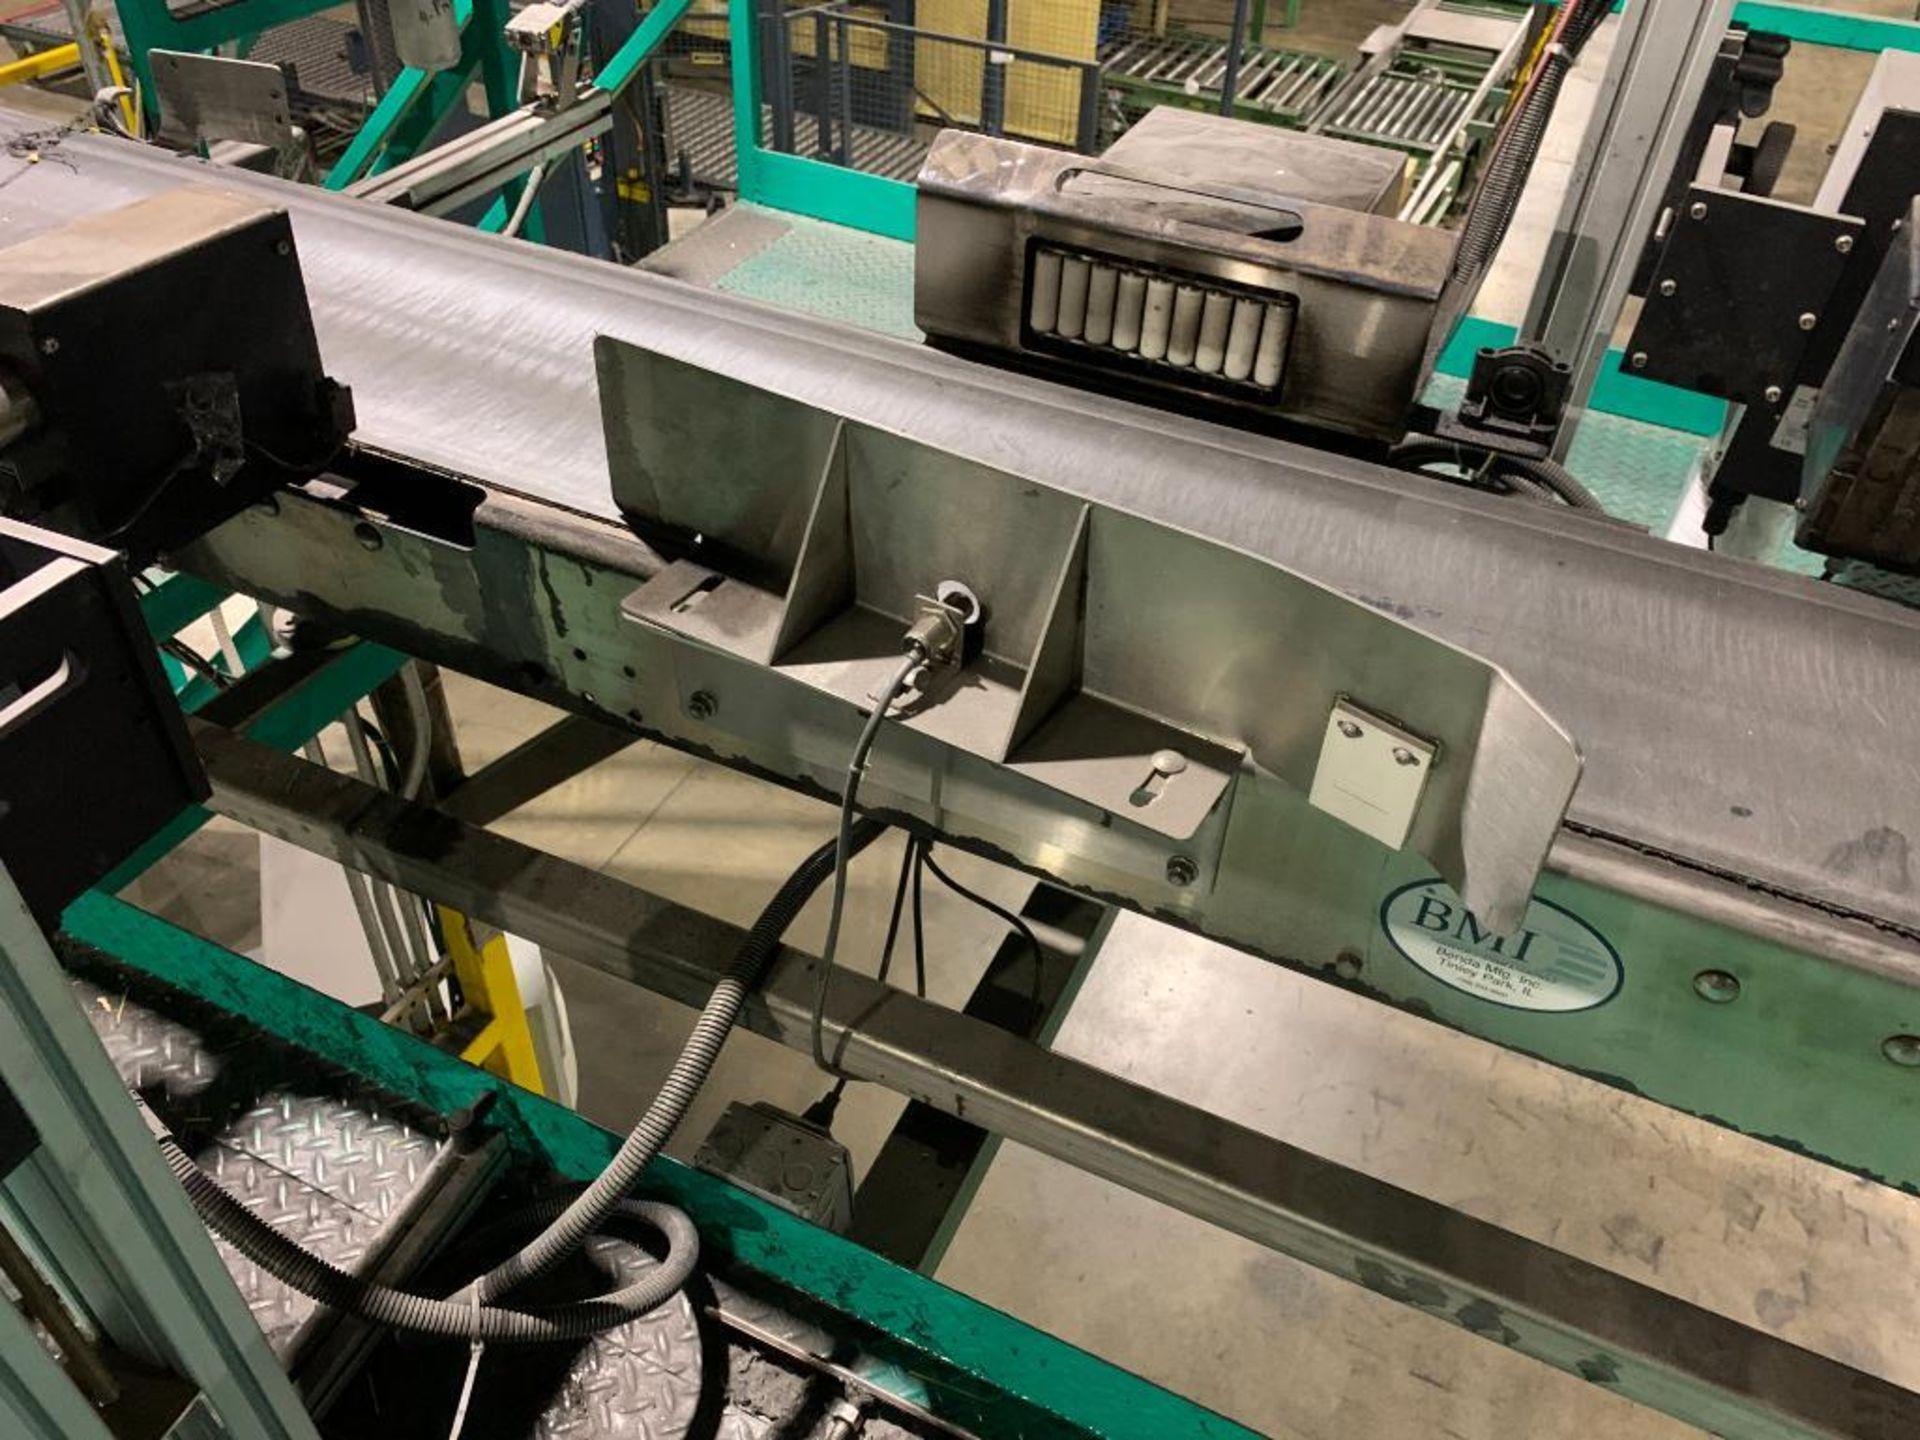 BMI stainless steel conveyor - Image 7 of 14